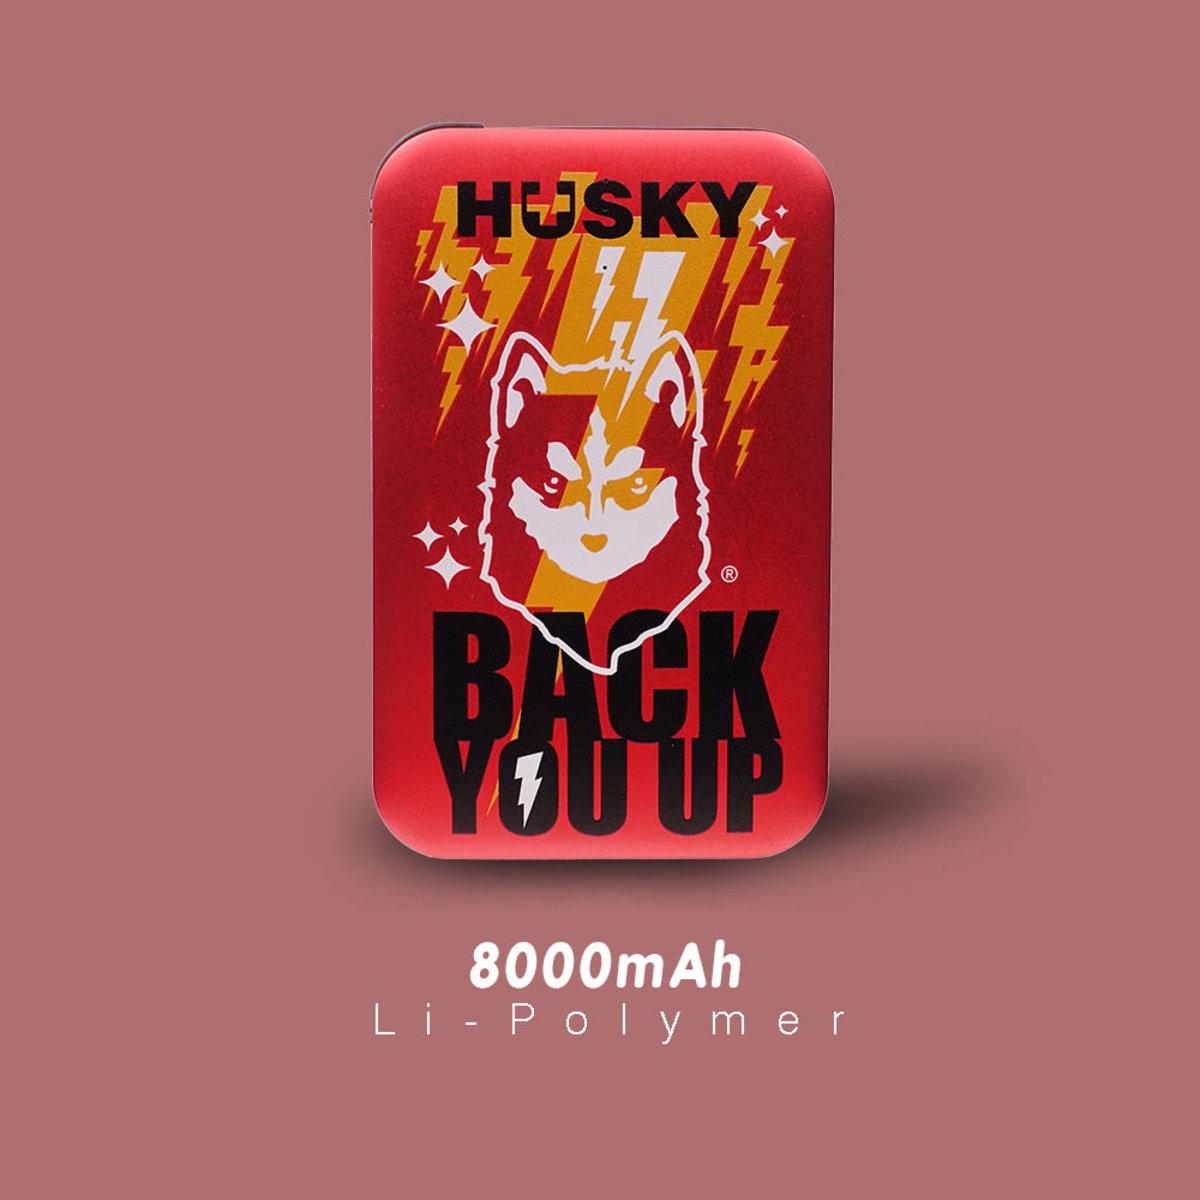 Husky x 3. Back you up / 8000mAh Power Bank